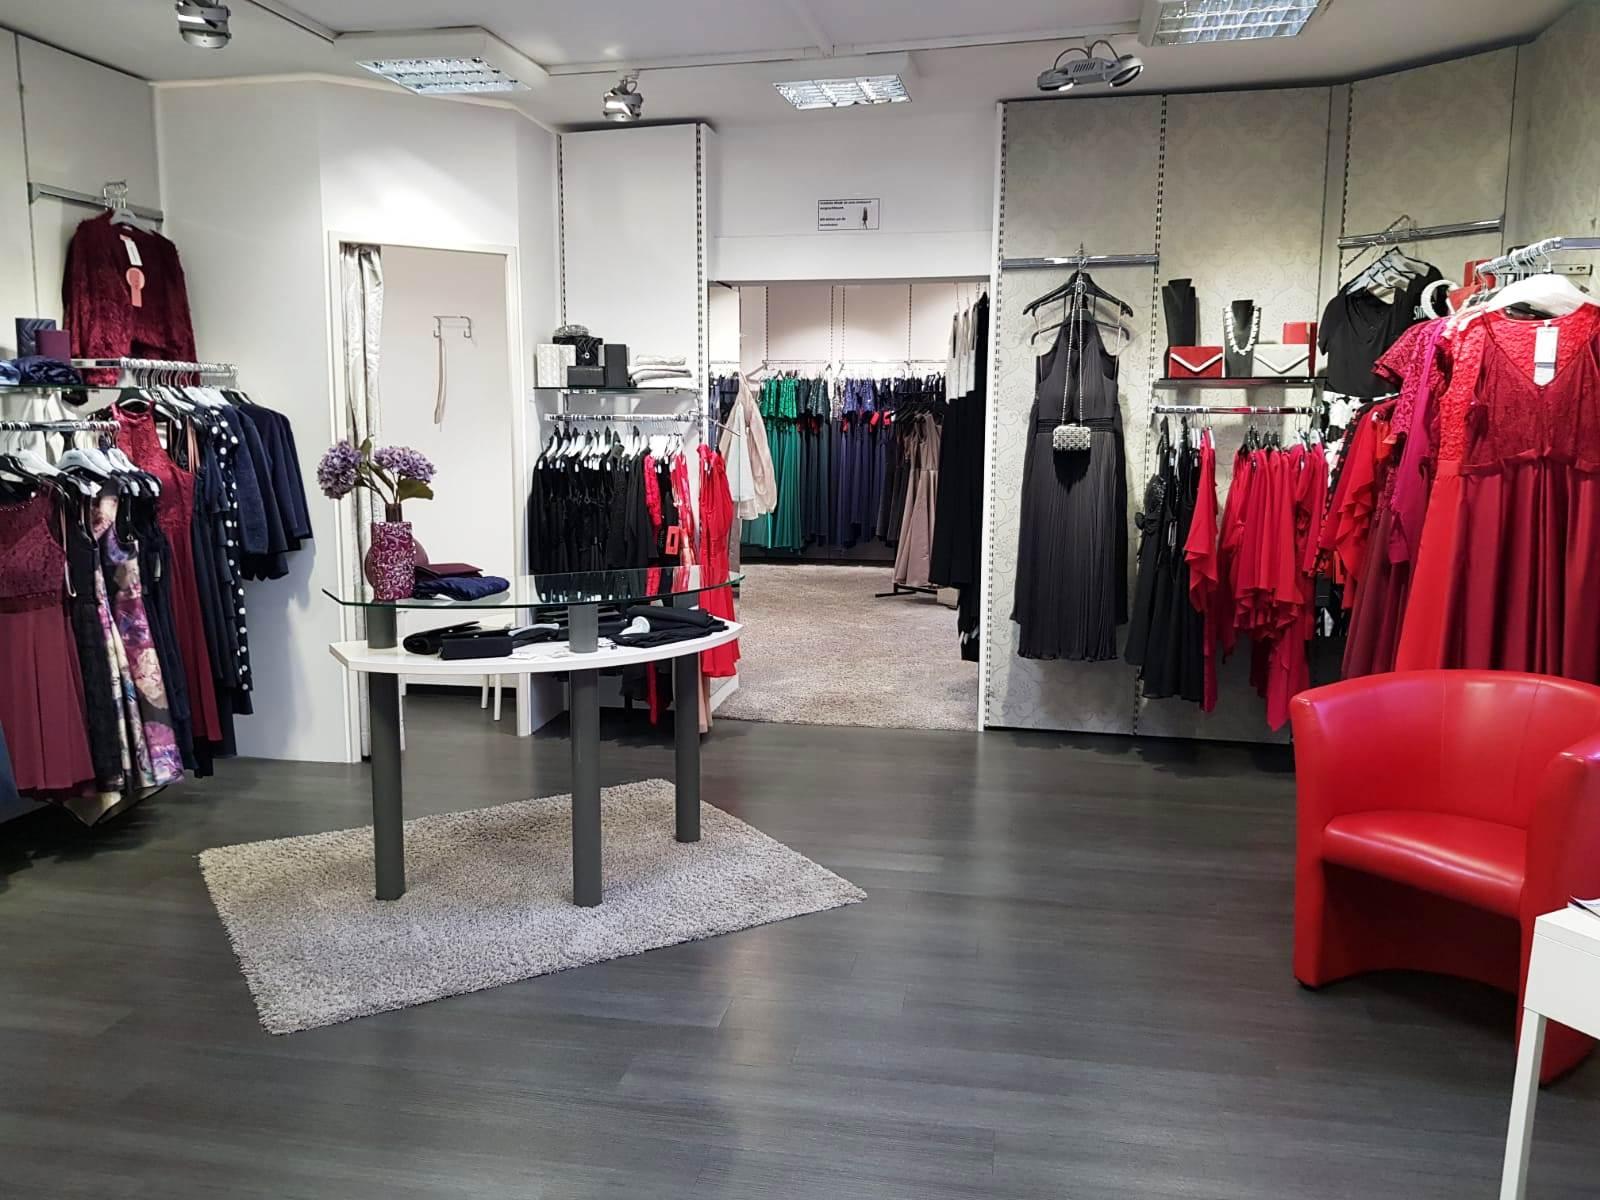 celle-shopping-rudel-kleidung-4.jpg